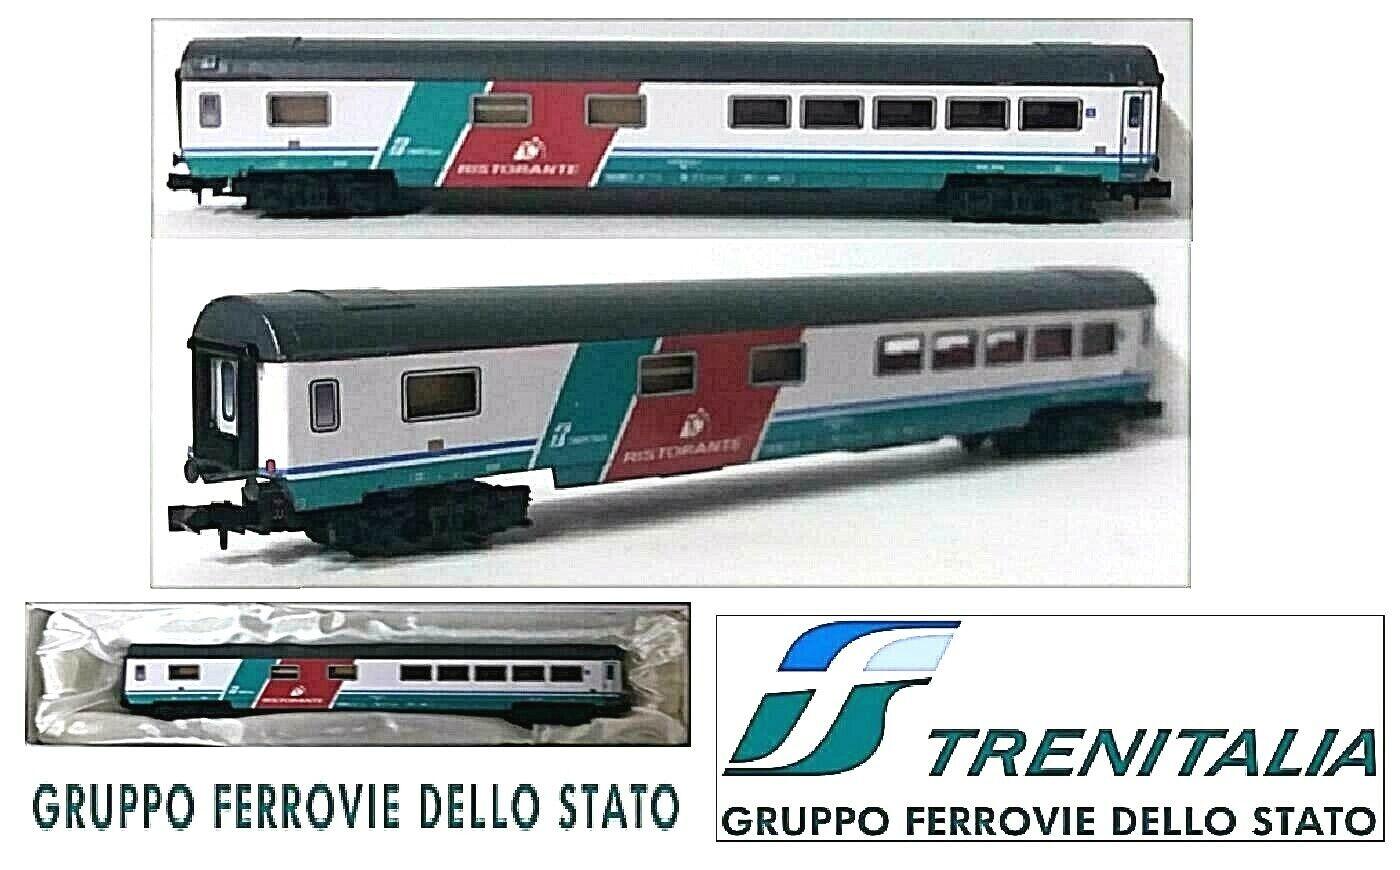 Railway Carriage Handmade Restaurant Trenitalia FS Italian Side Slab Ladder-N